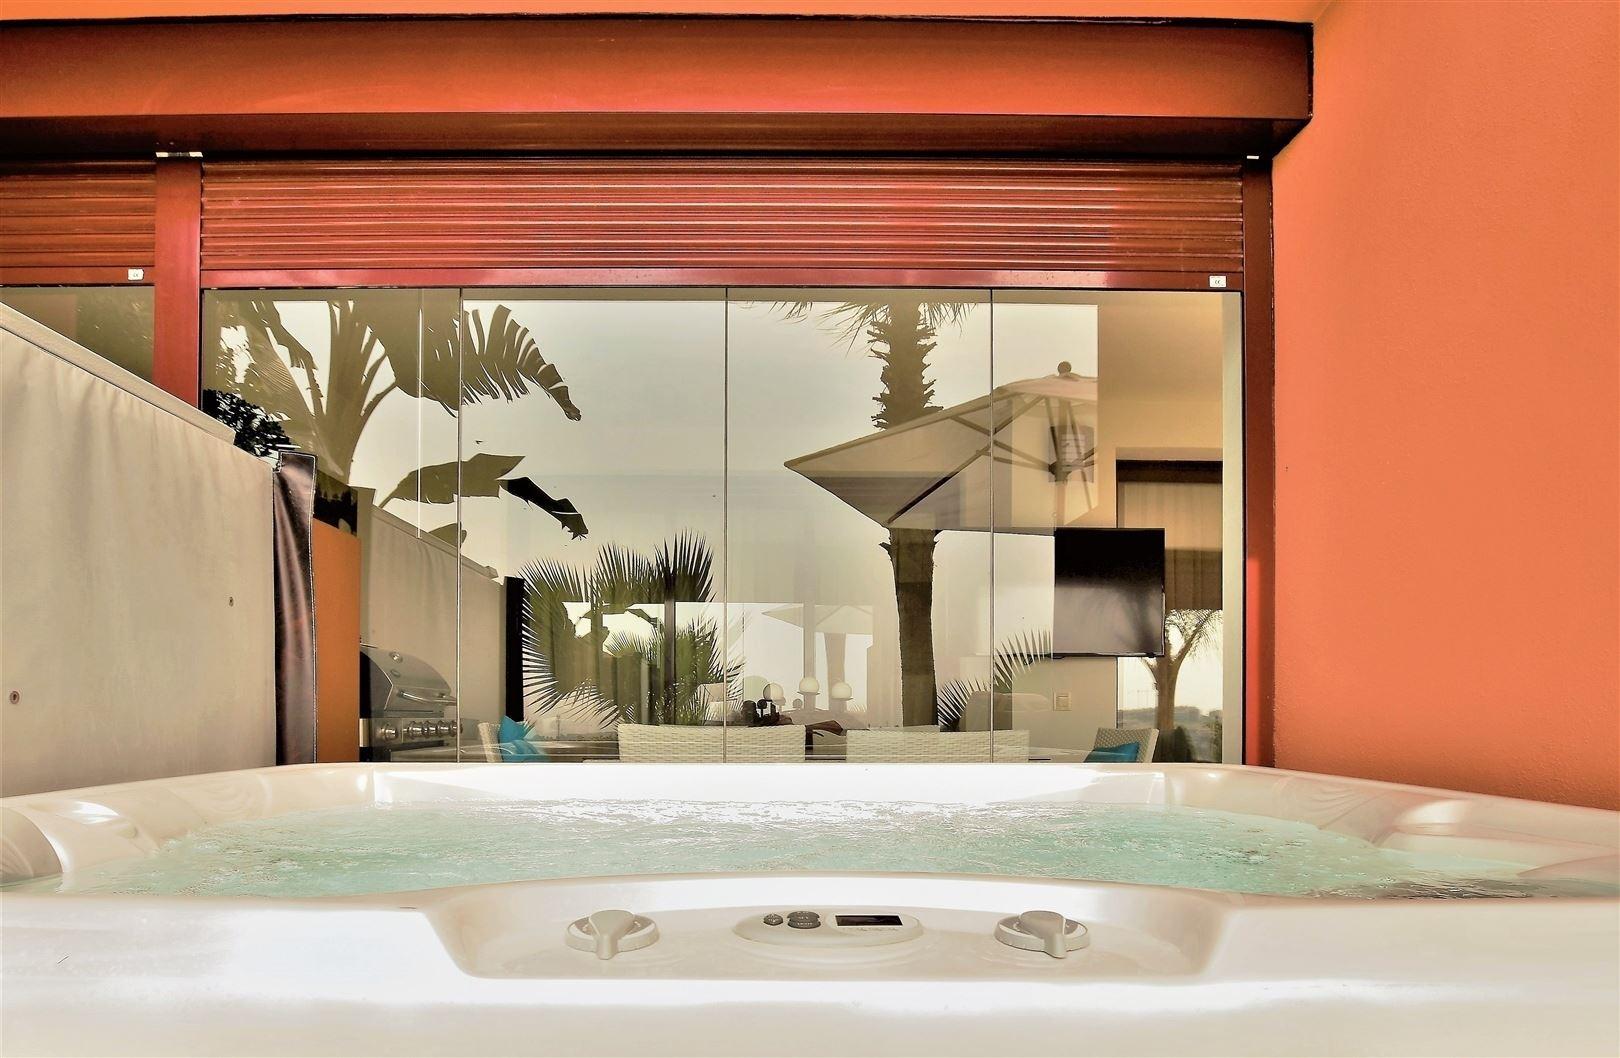 Foto 14 : Appartement te 29679 MARBELLA (Spanje) - Prijs € 1.750